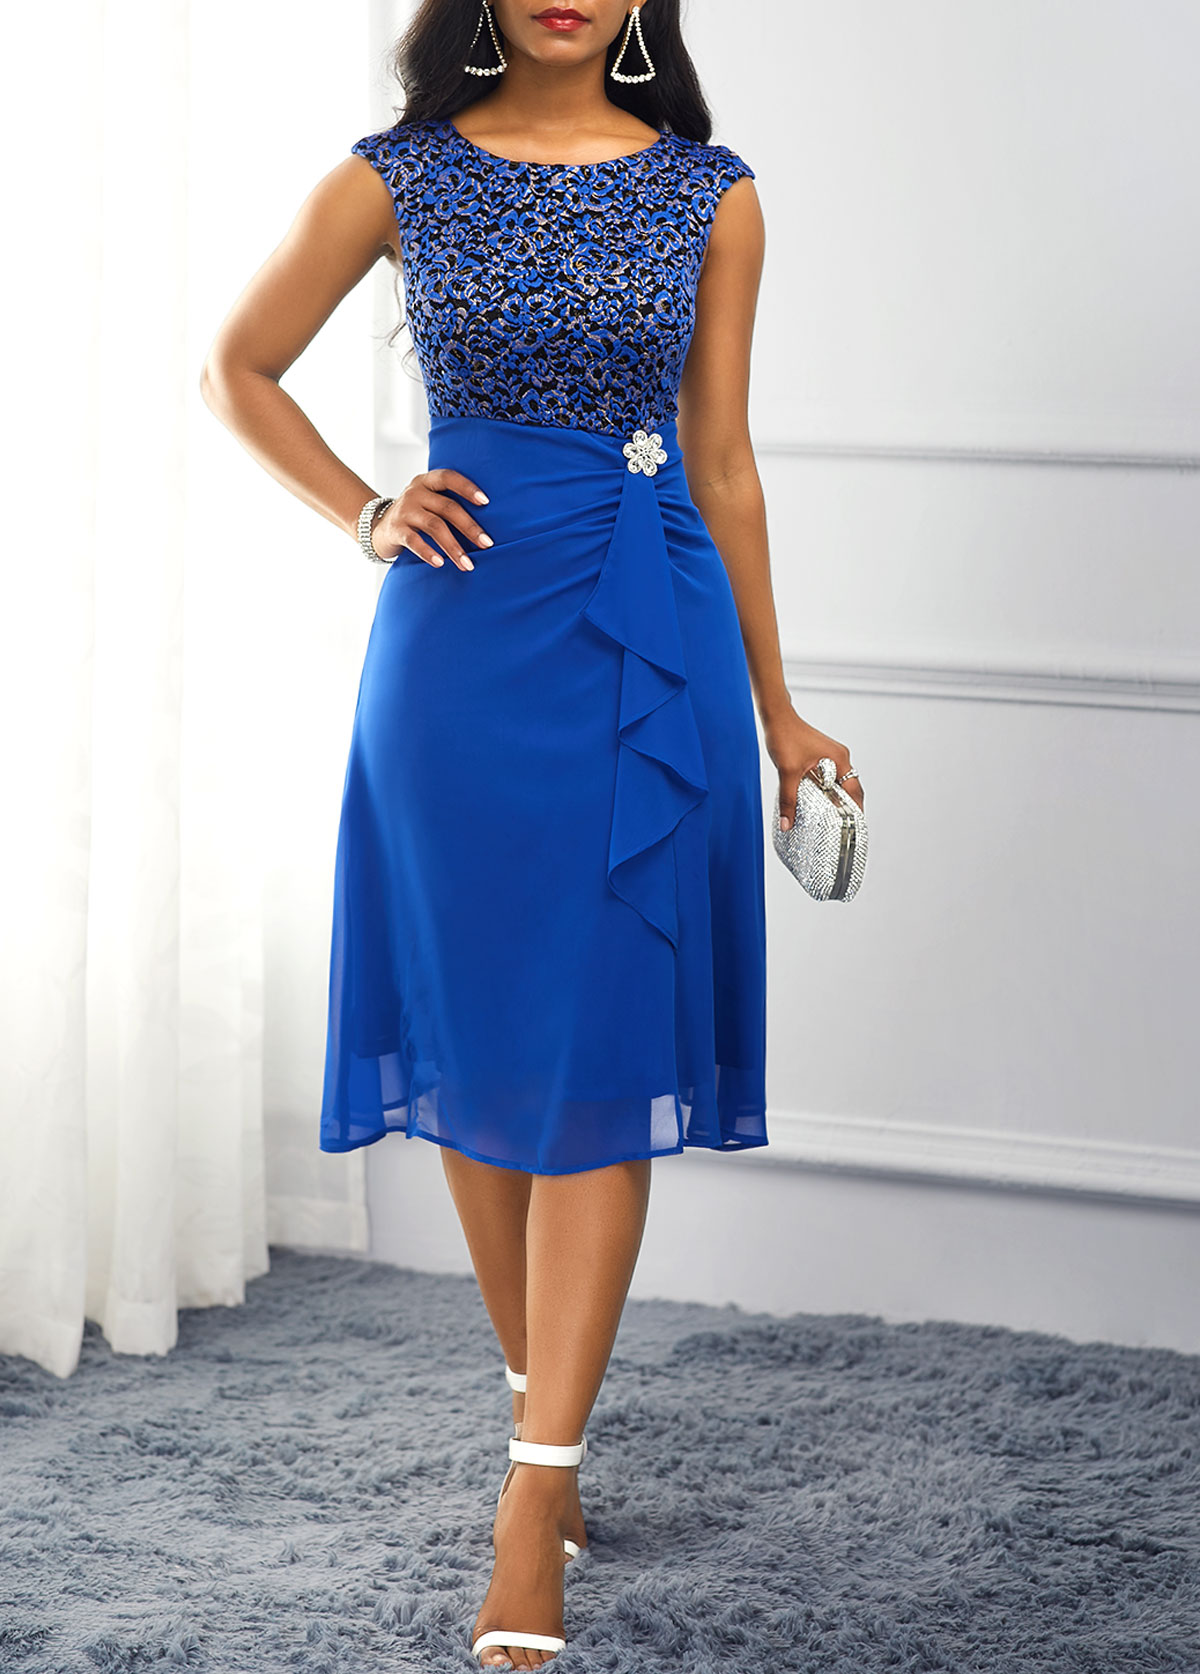 Rhinestone Embellished Royal Blue High Waist Dress